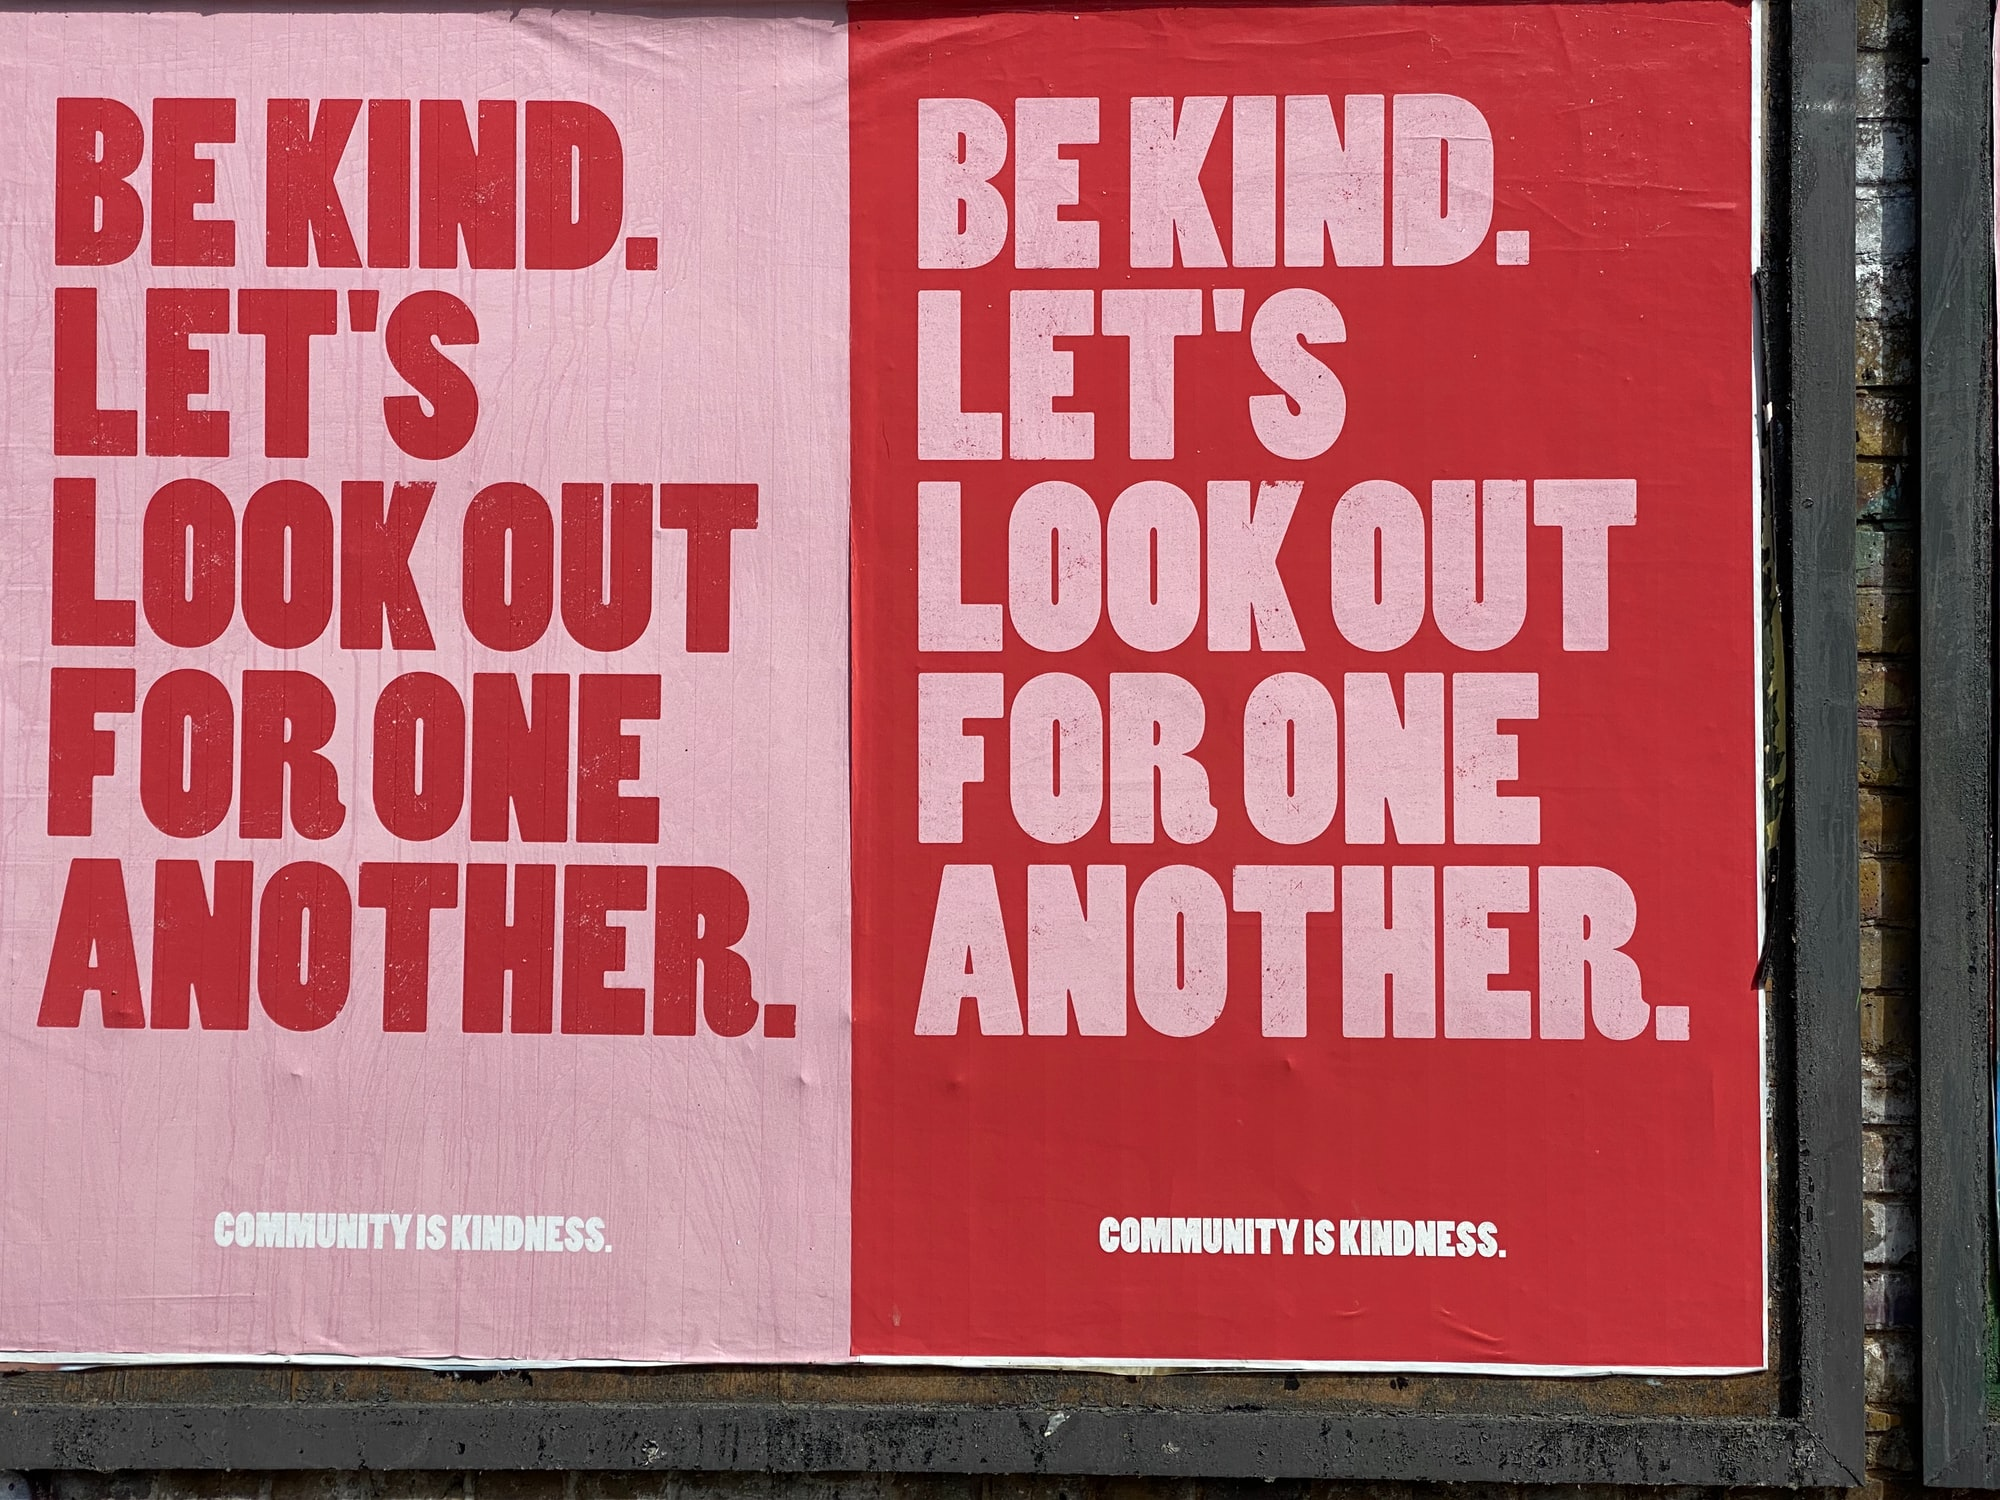 Posters in Brick Lane, east London encourage community spirit